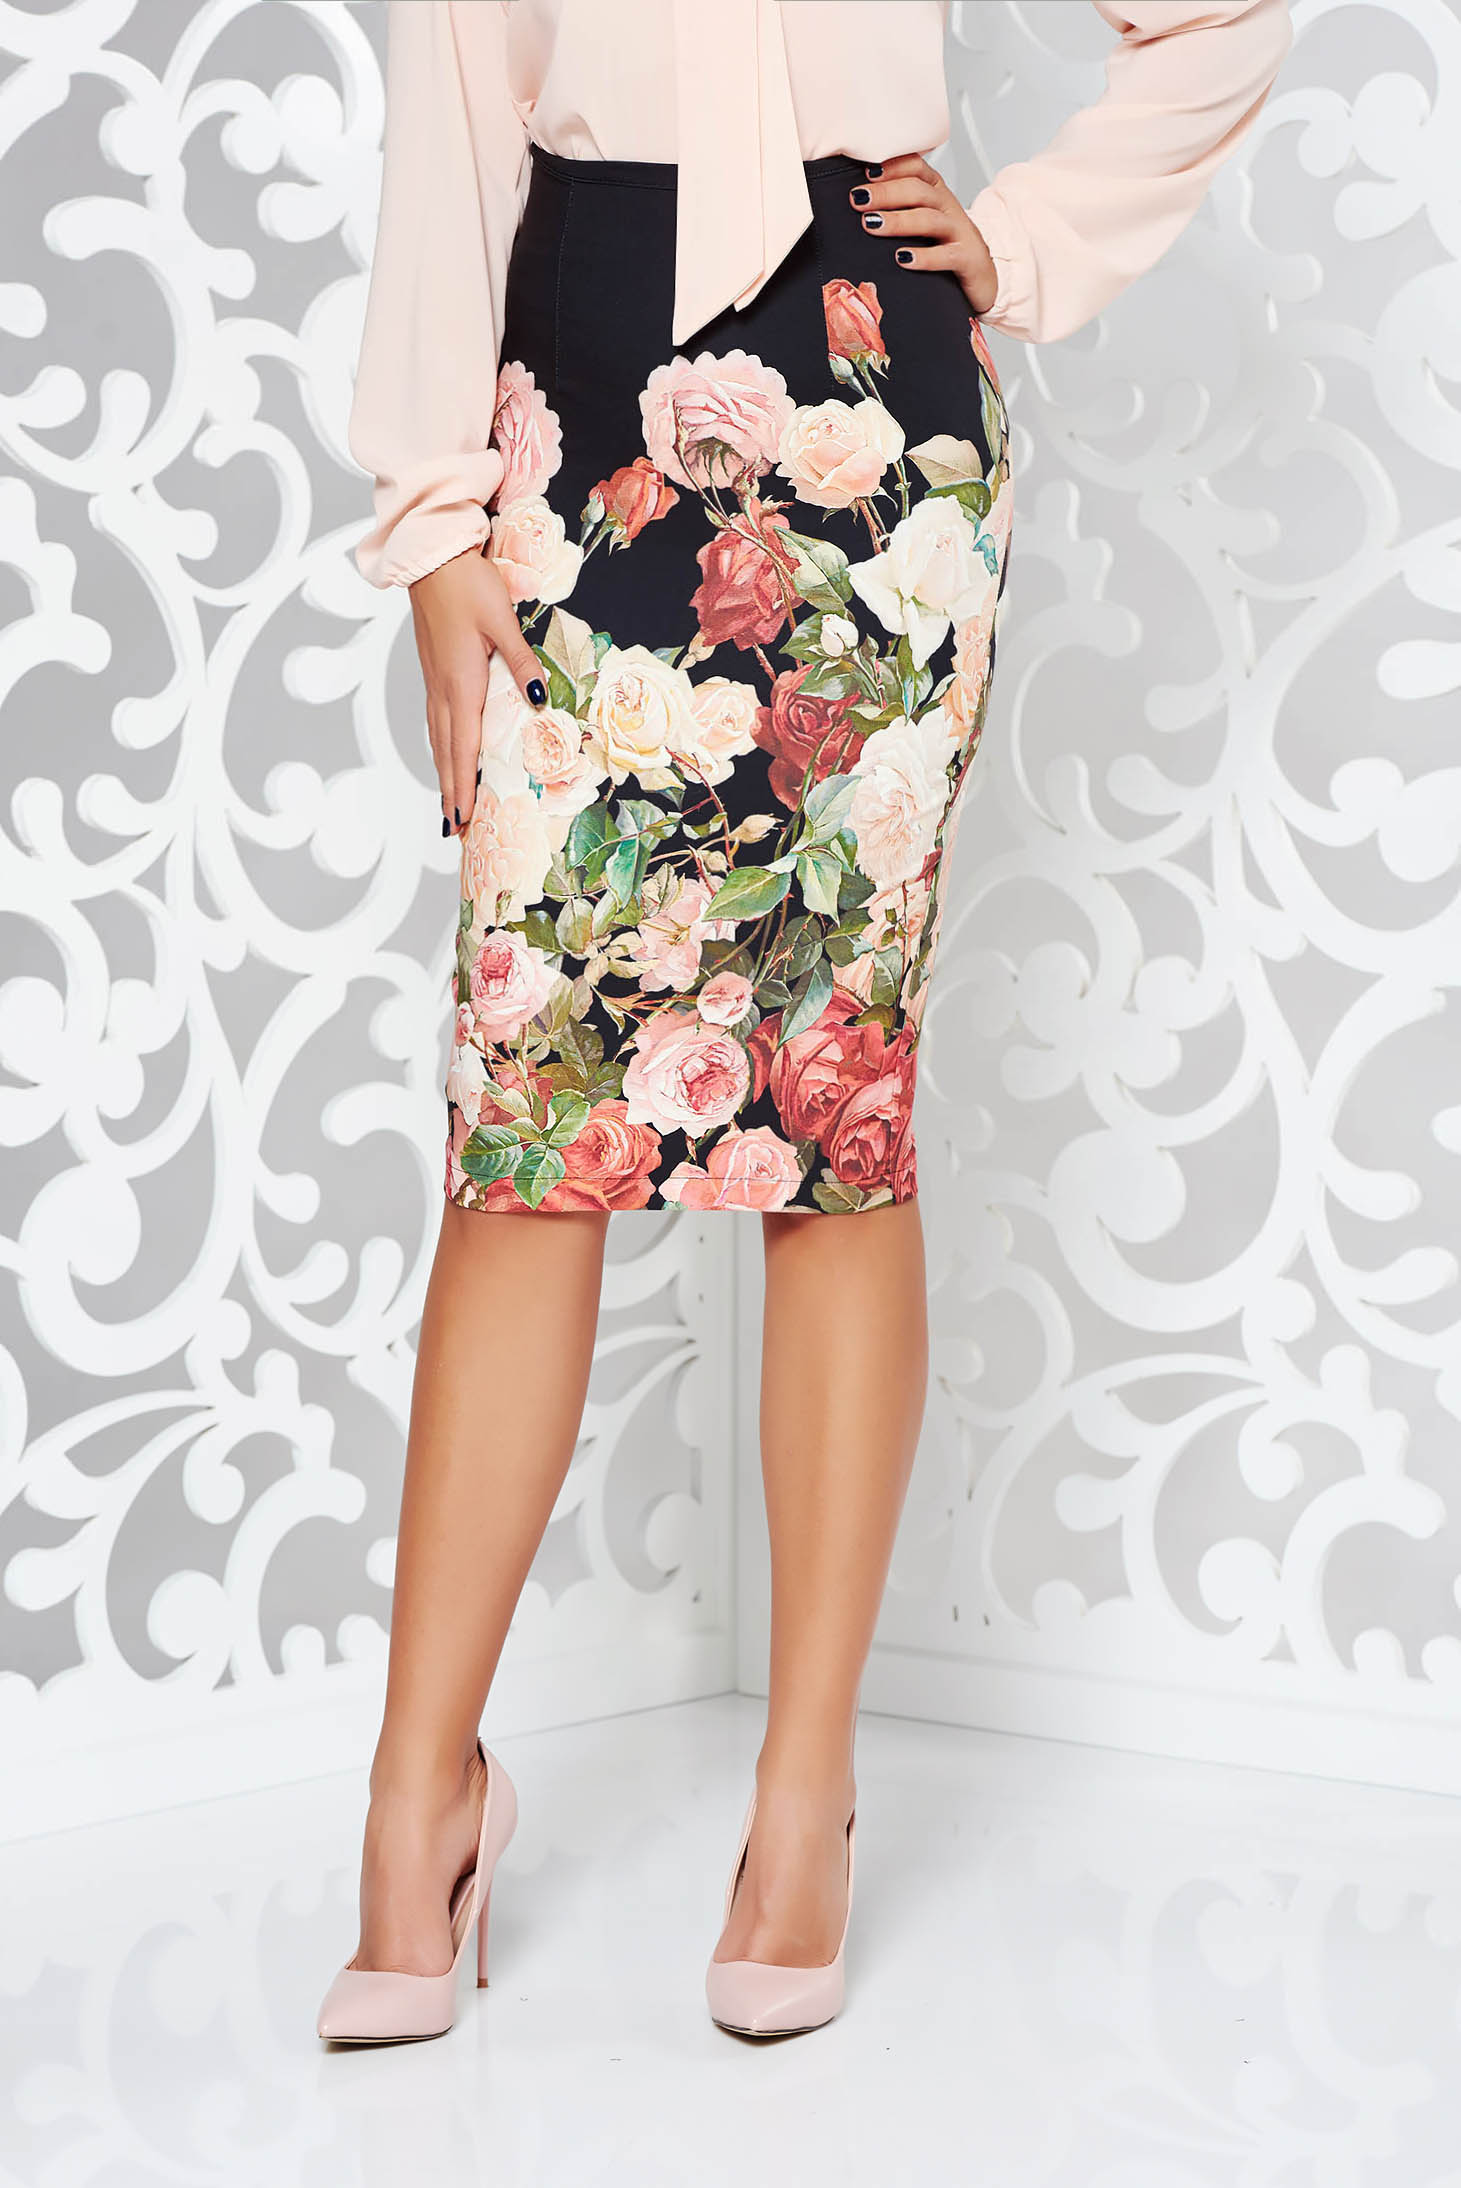 Starshiners Black Skirt Office Midi Pencil Slightly Elastic Fabric Petal With Floral Prints